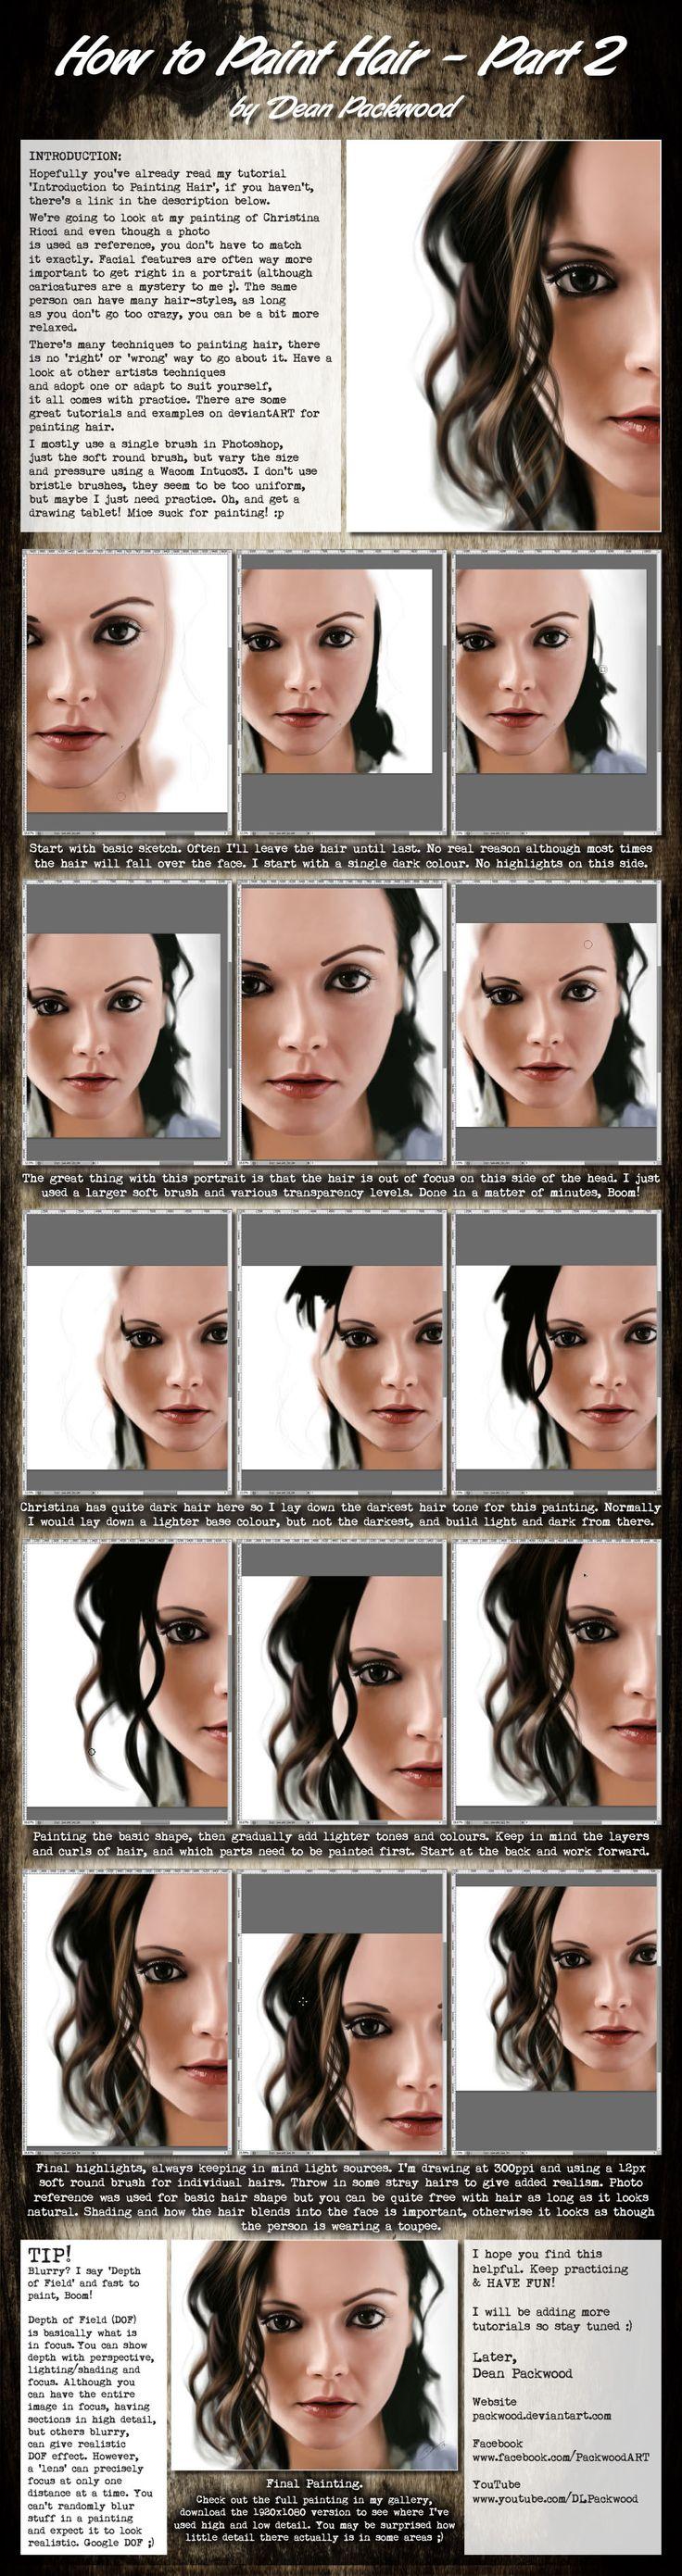 photo retouch - Photoshop Tutorials - CreateBlog